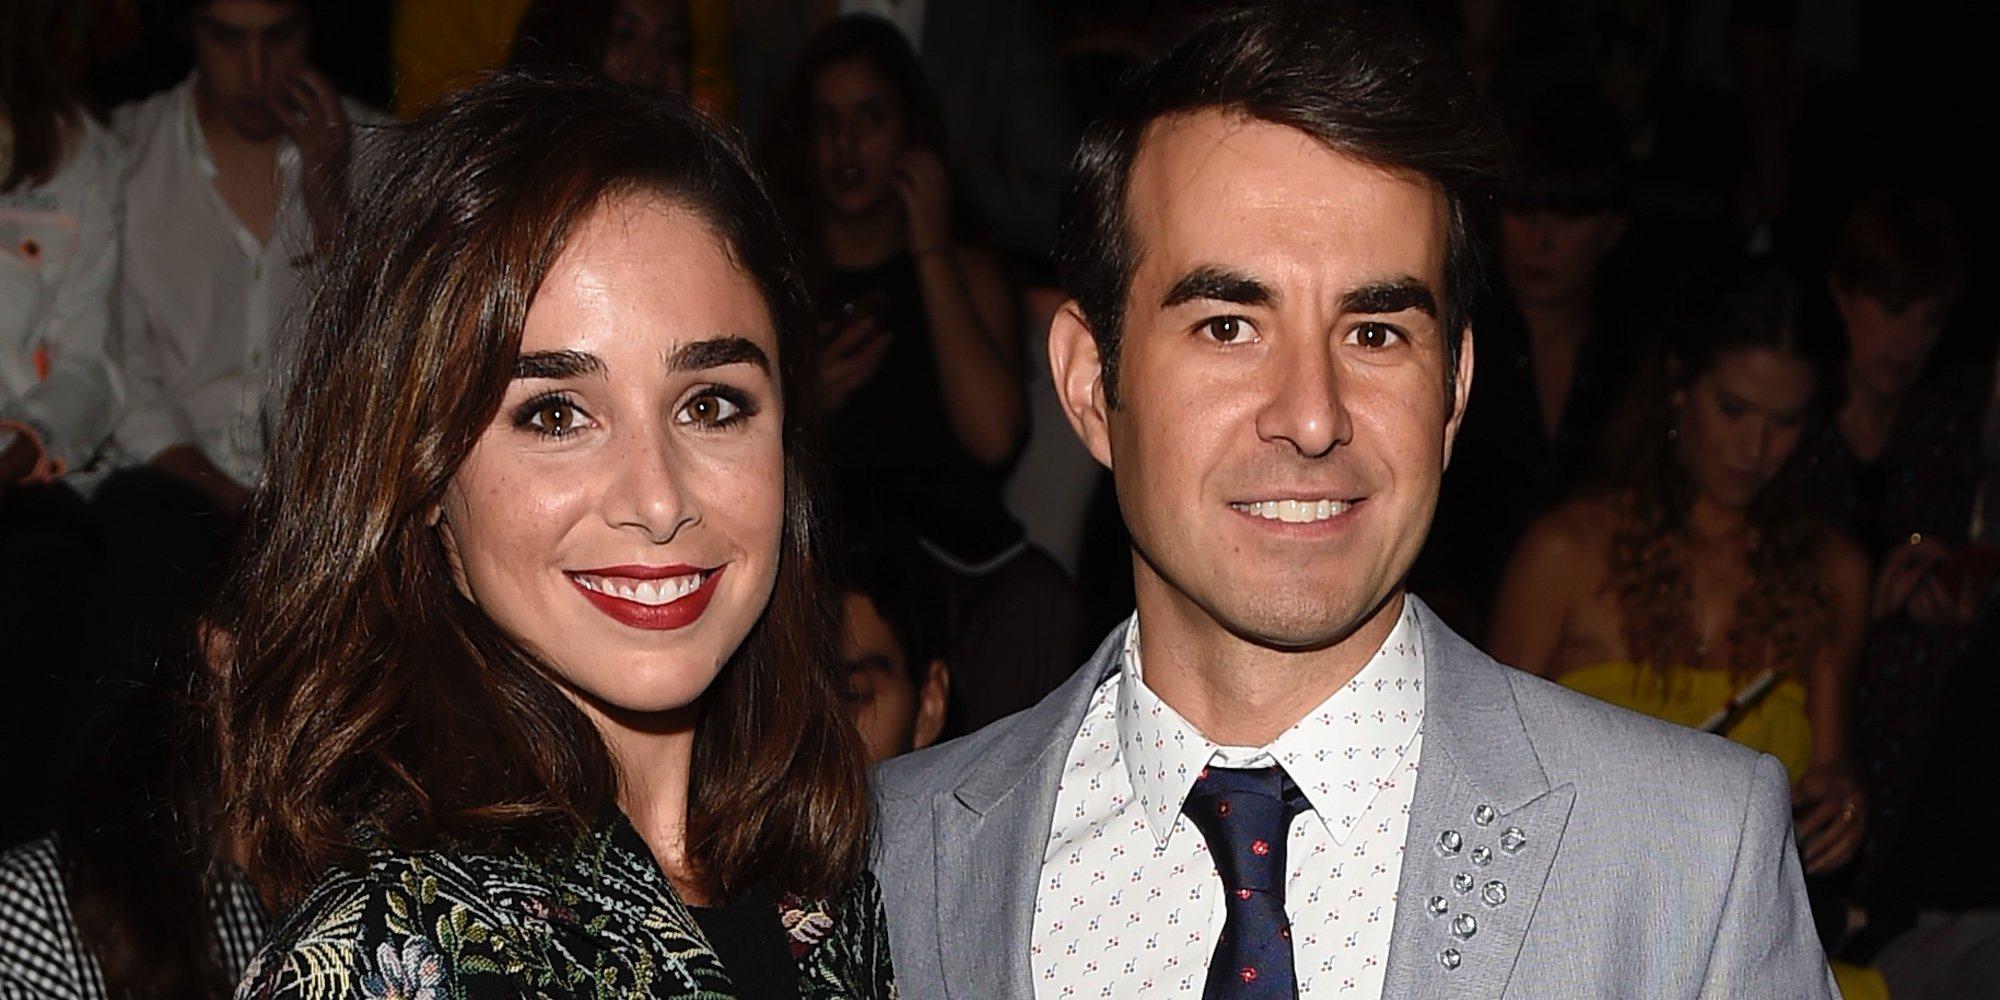 Daniel Muriel y Candela Serrat se han prometido